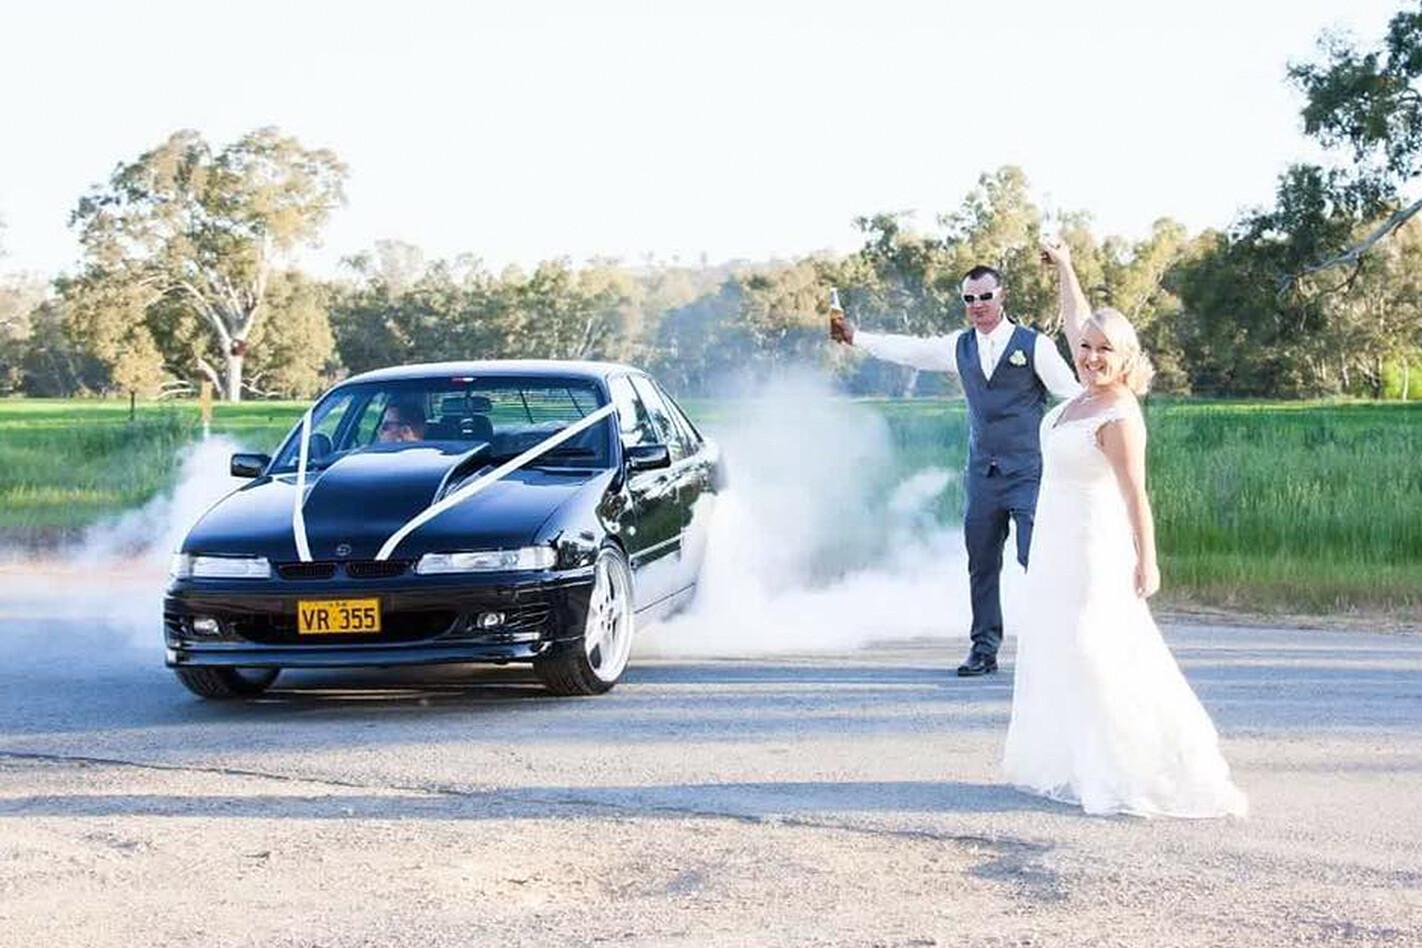 Brett Crain's wedding car